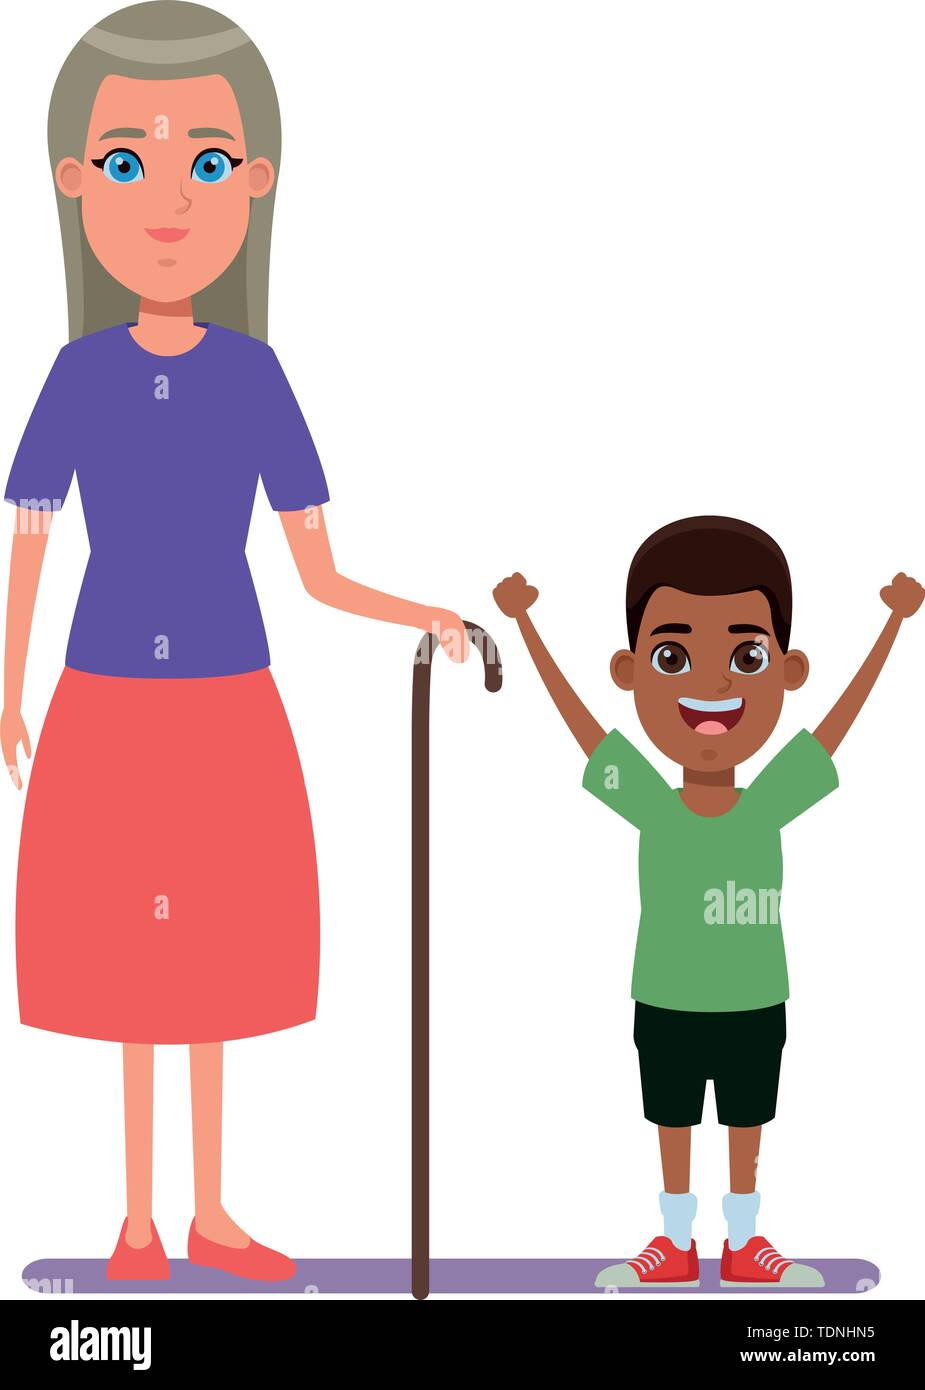 Familie avatar Großmutter mit Zuckerrohr Neben junge Profil Bild cartoon afroamerican Charakter portrait Vector Illustration graphic design Stockbild